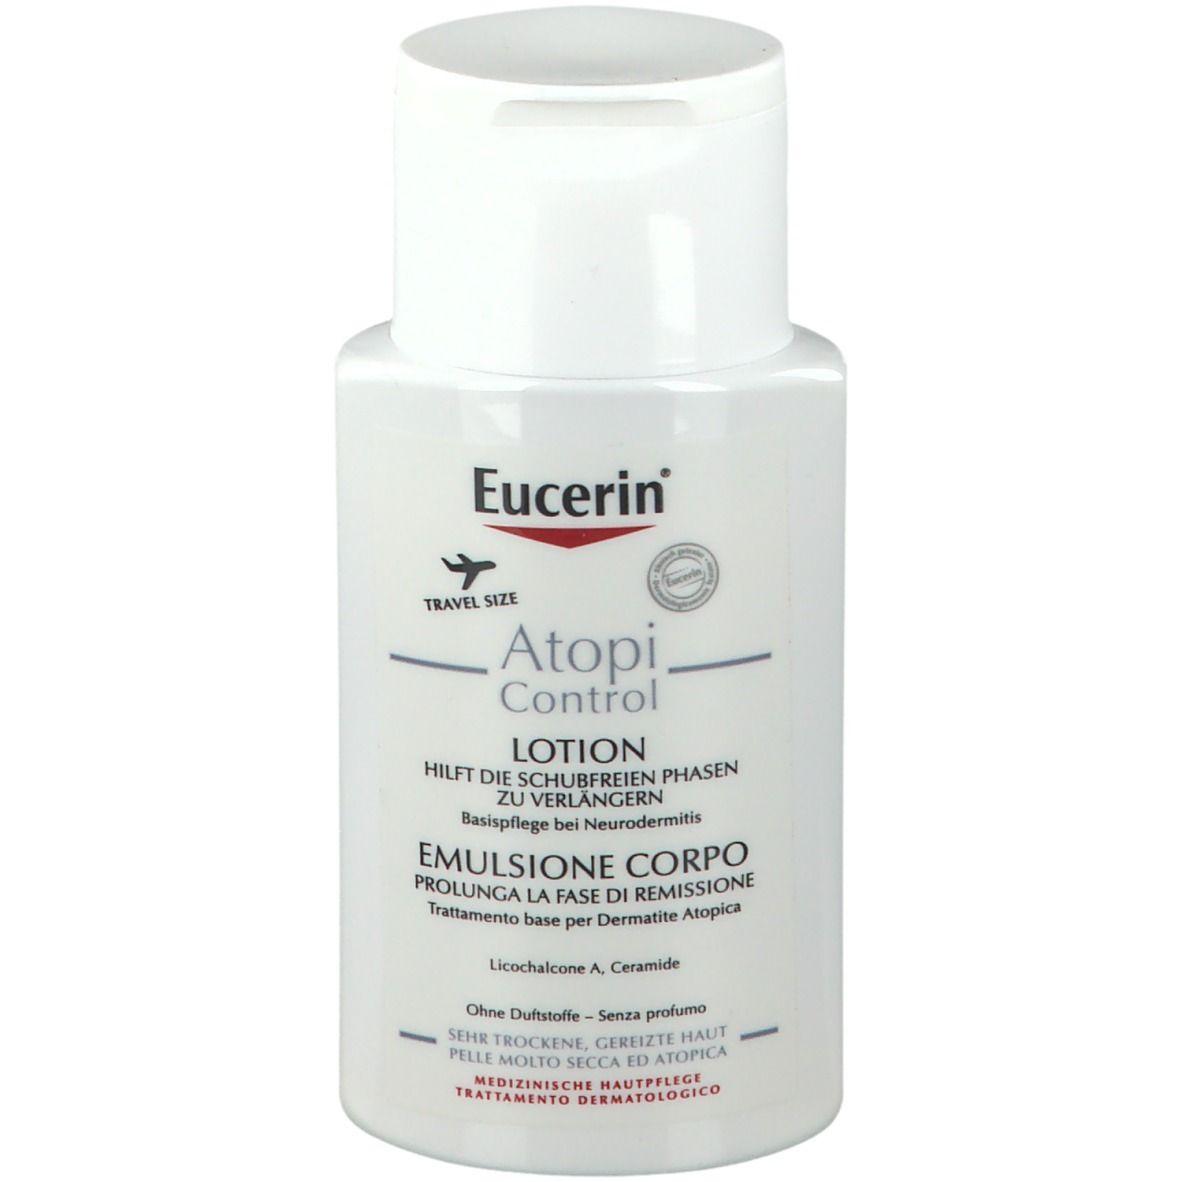 Image of Eucerin® AtopiControl Lotion 100ml Reisegröße